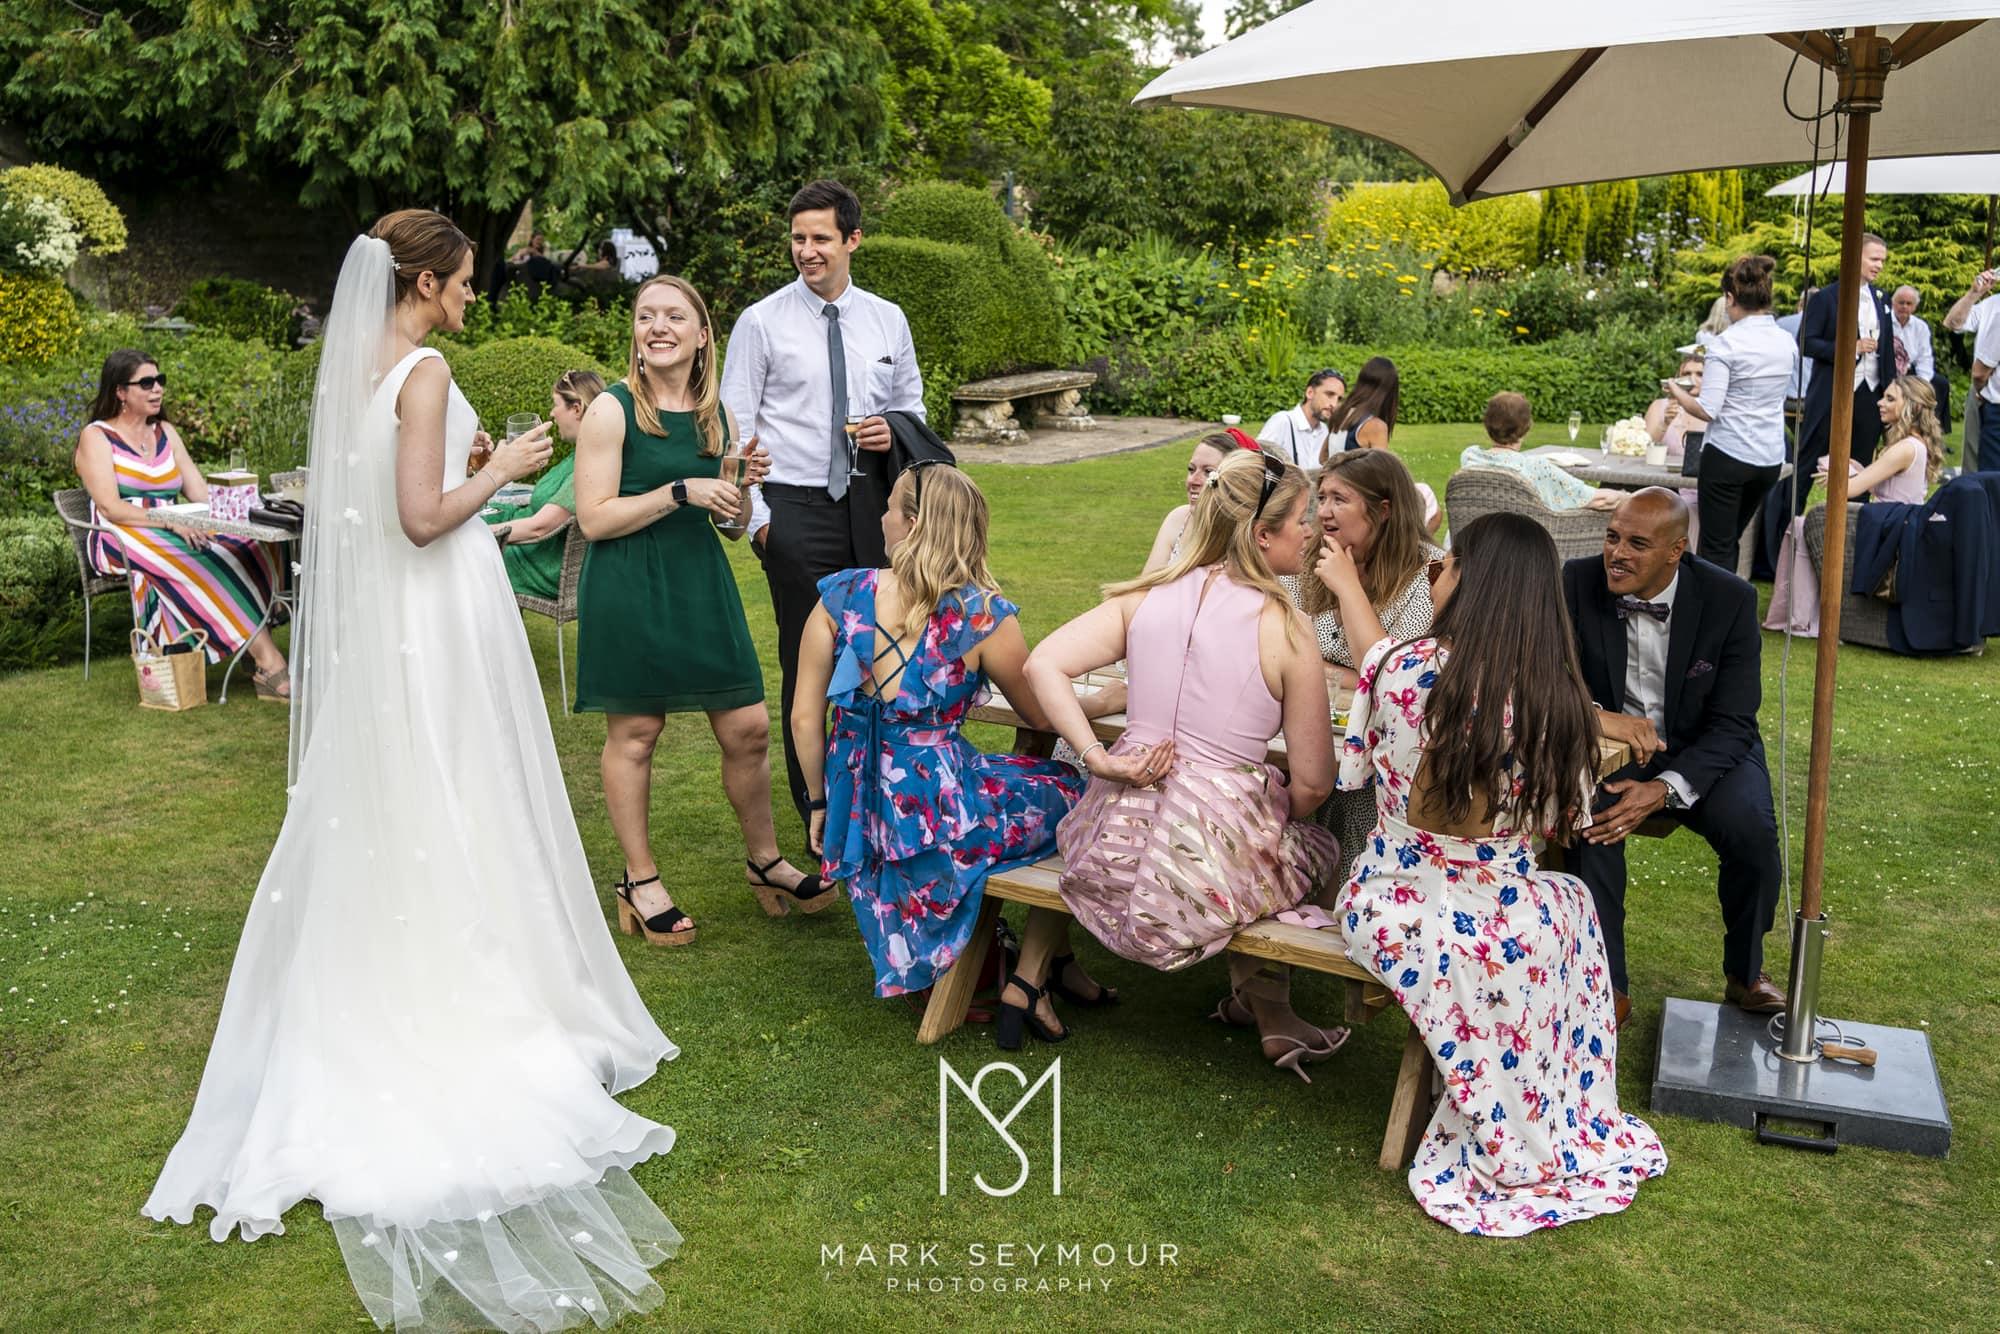 Barnsley House Wedding Photographer - Olivia and James' wedding 14